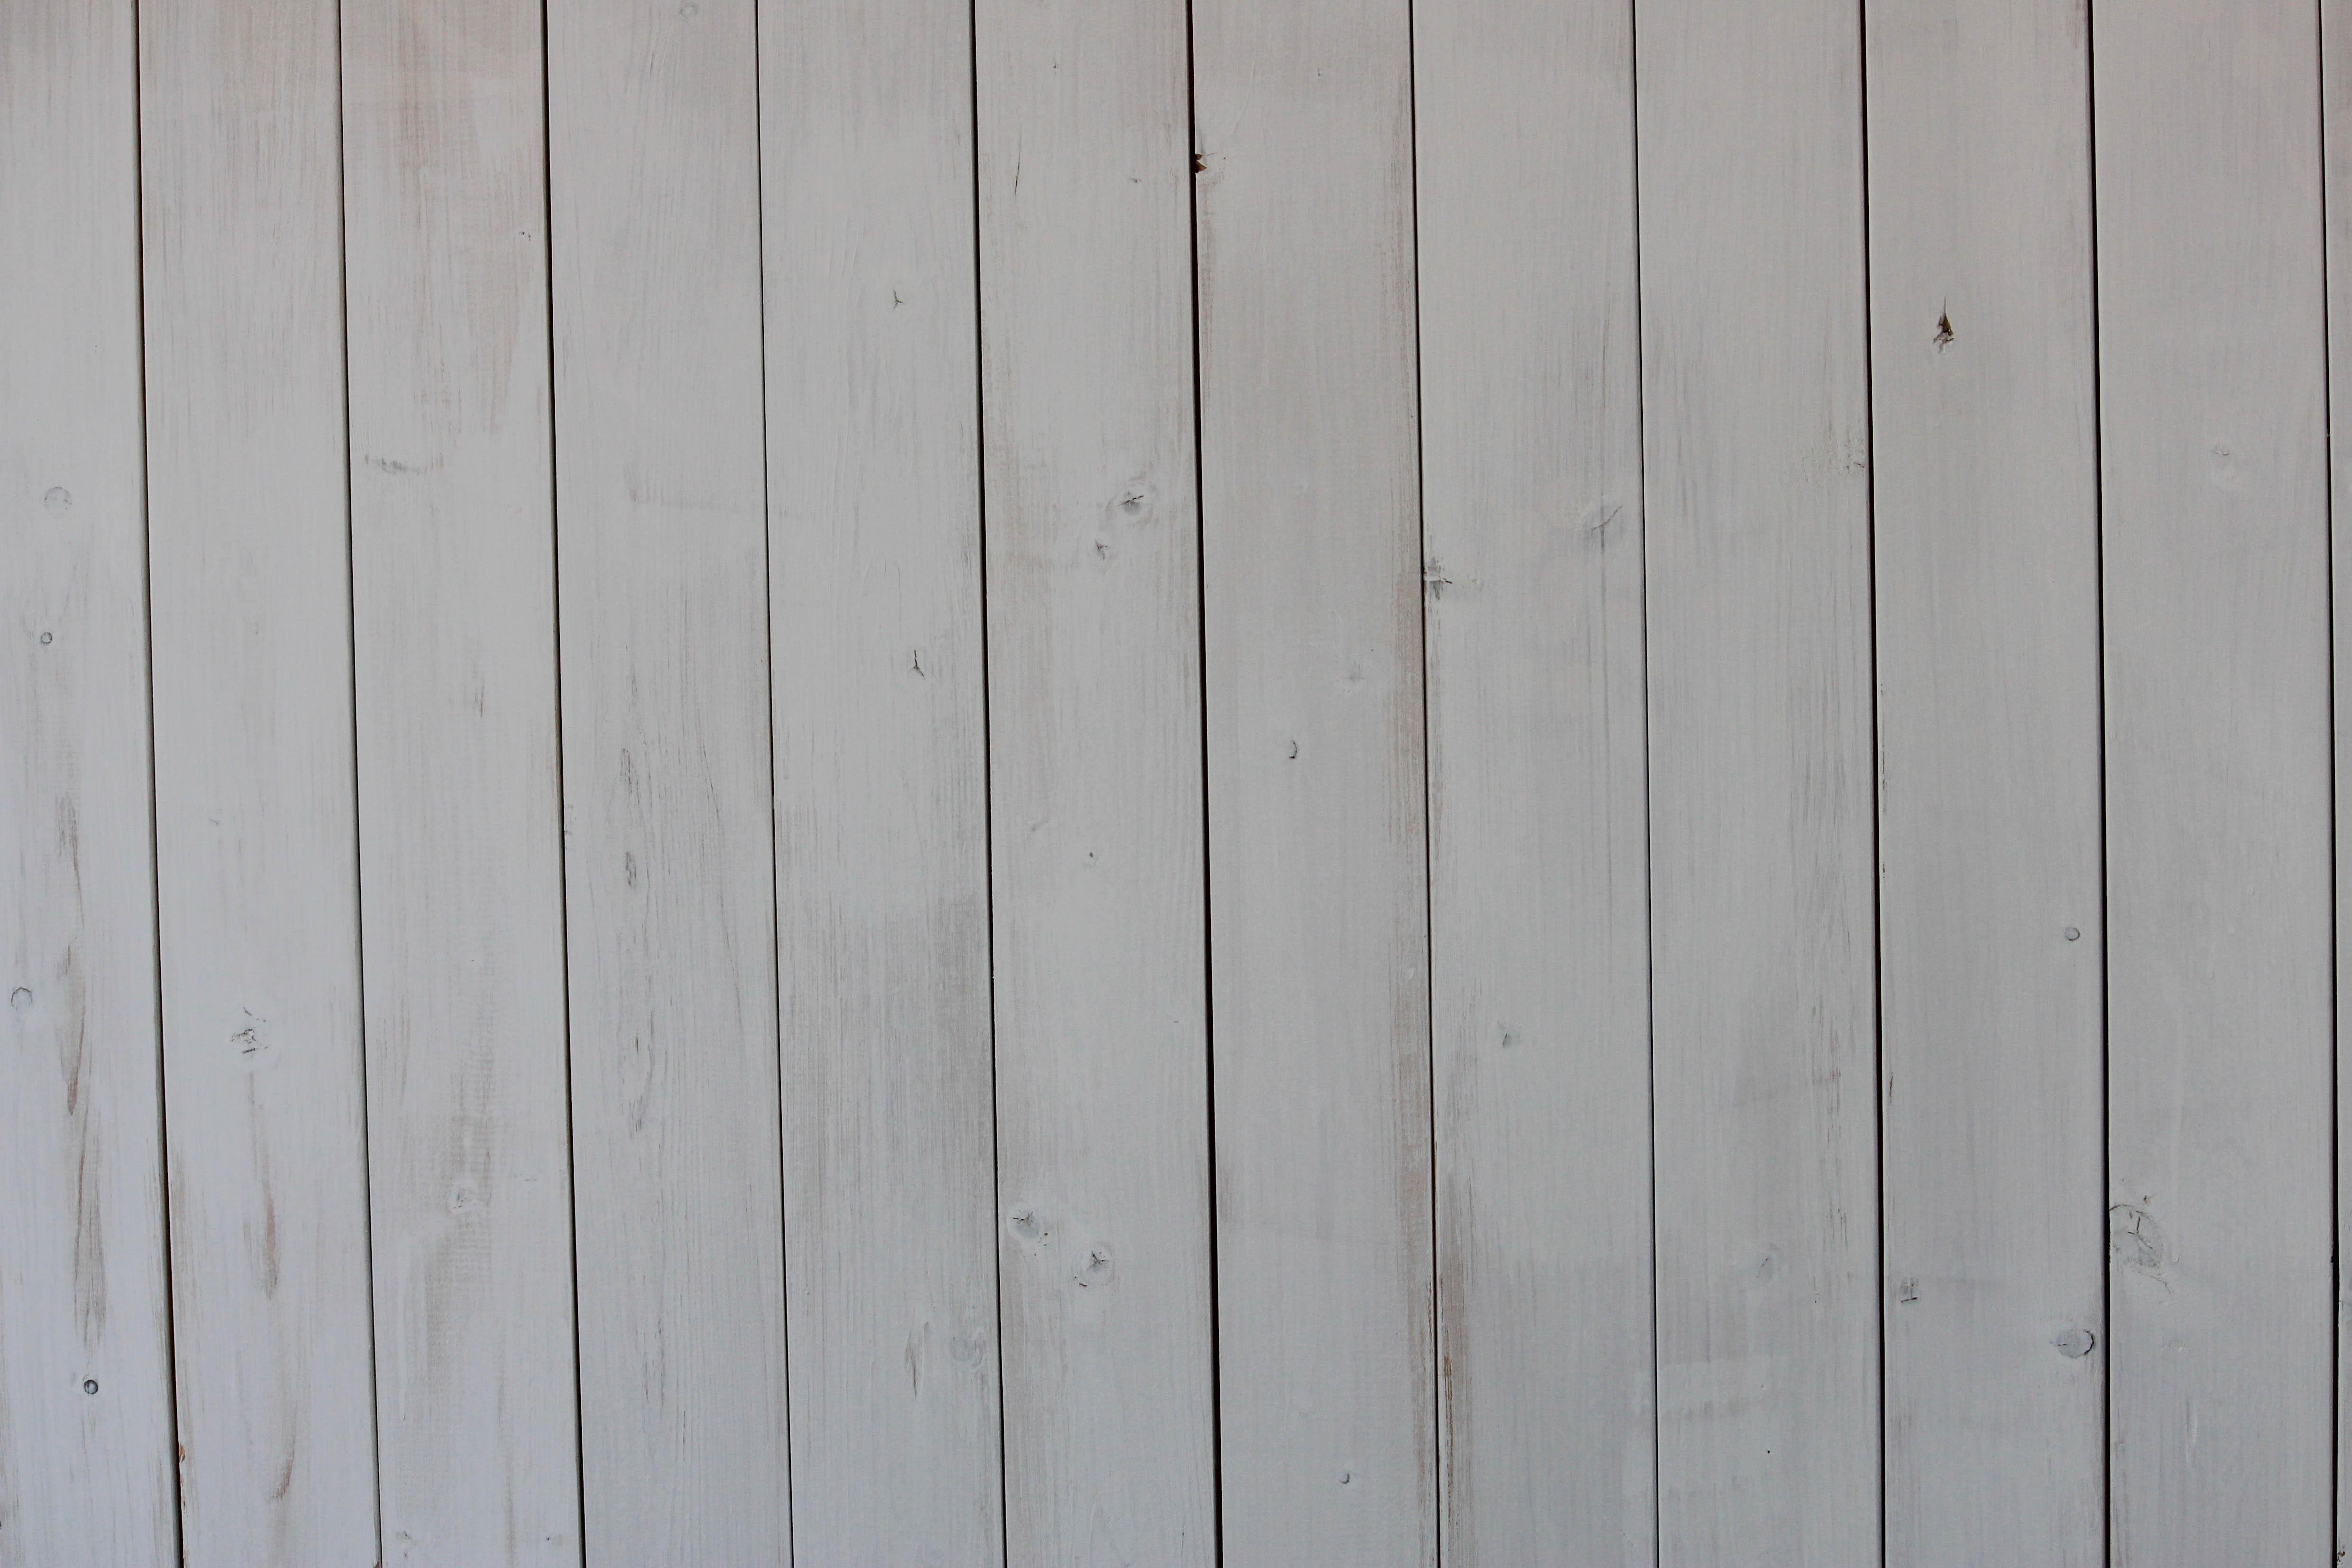 4 Steps To Whitewash Wood Diy Tutorial For Whitewashing A Wooden Pallet Www